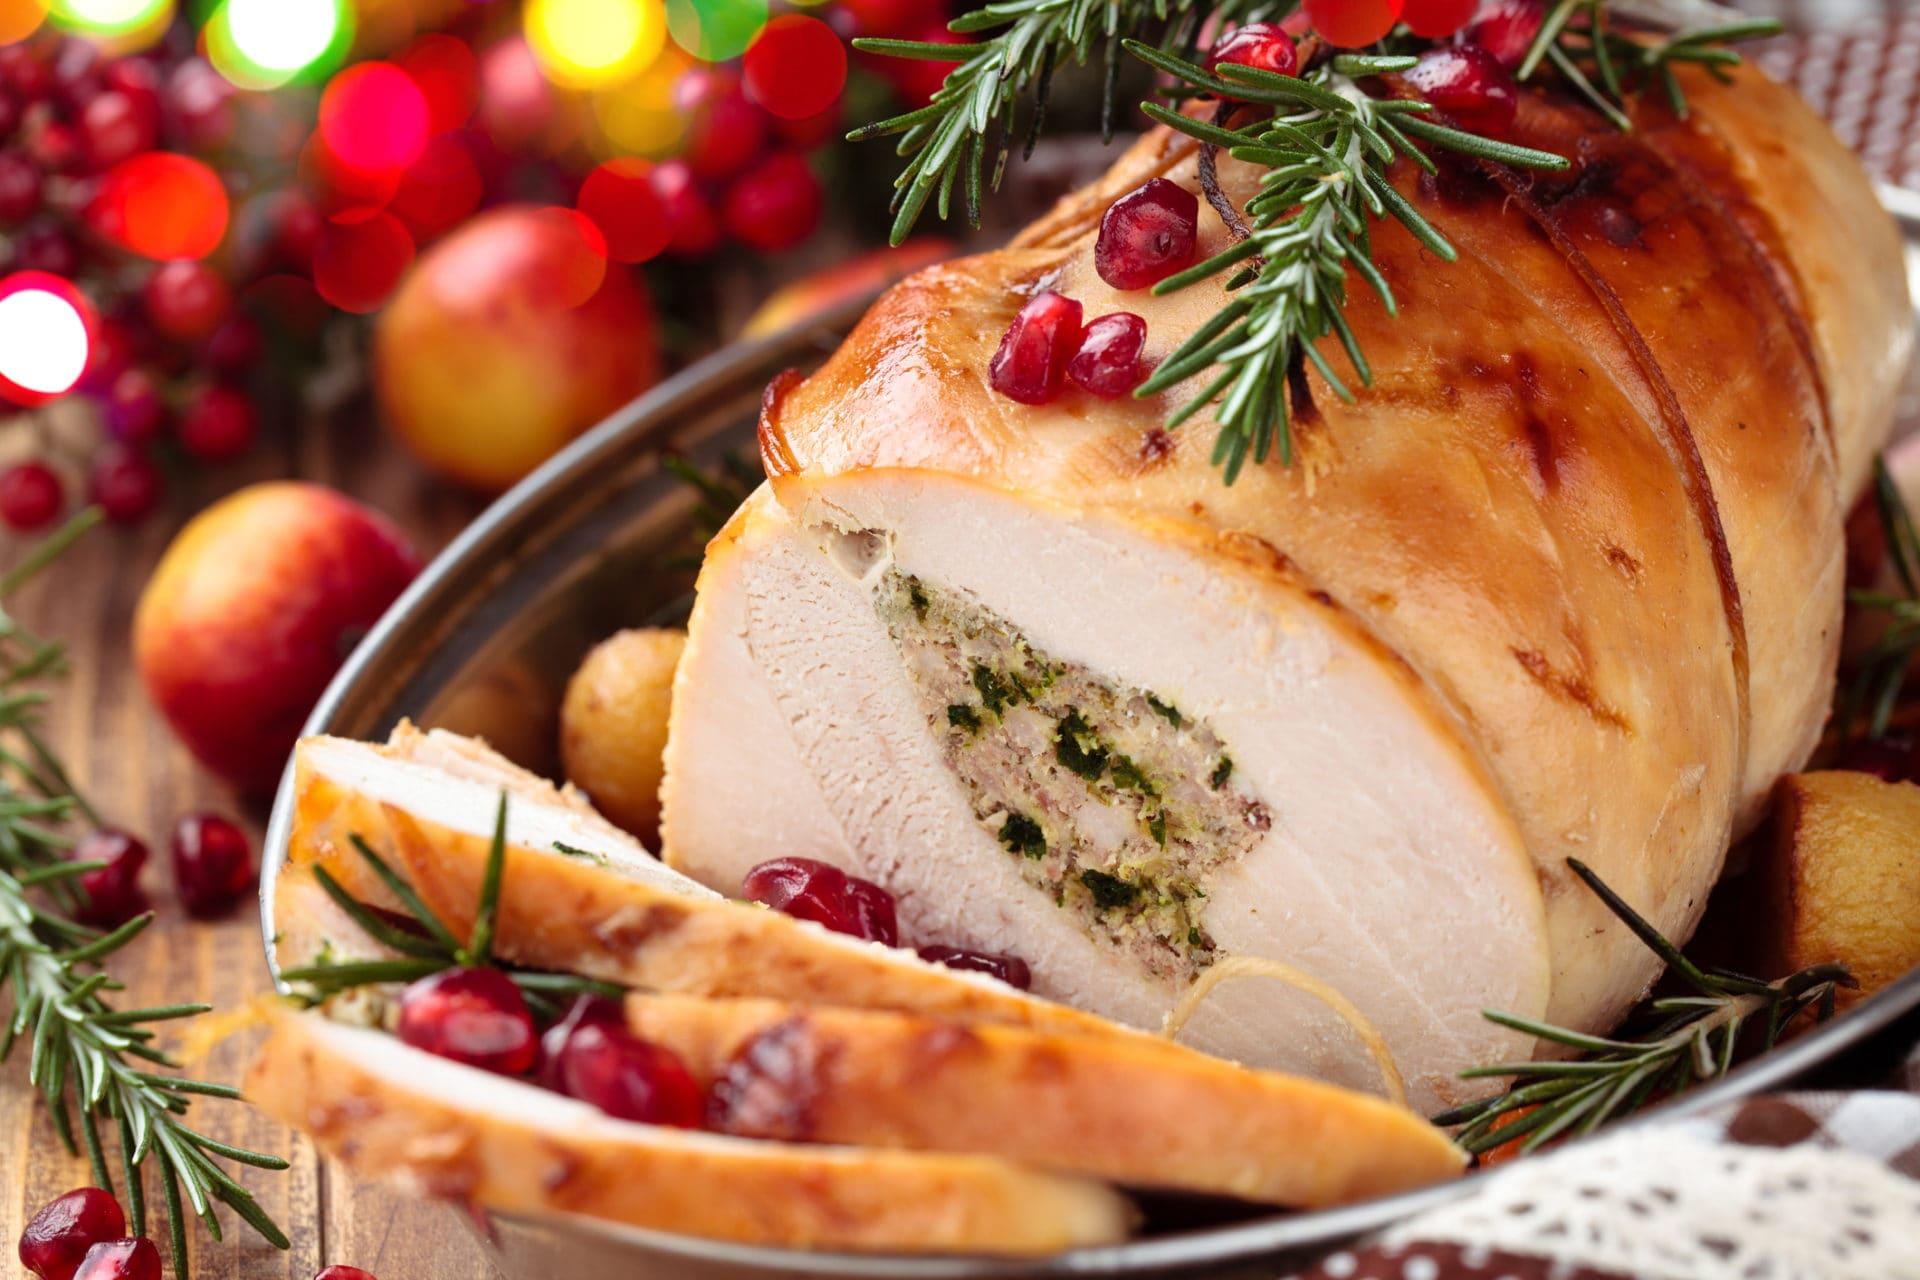 Turkey breast for holidays.